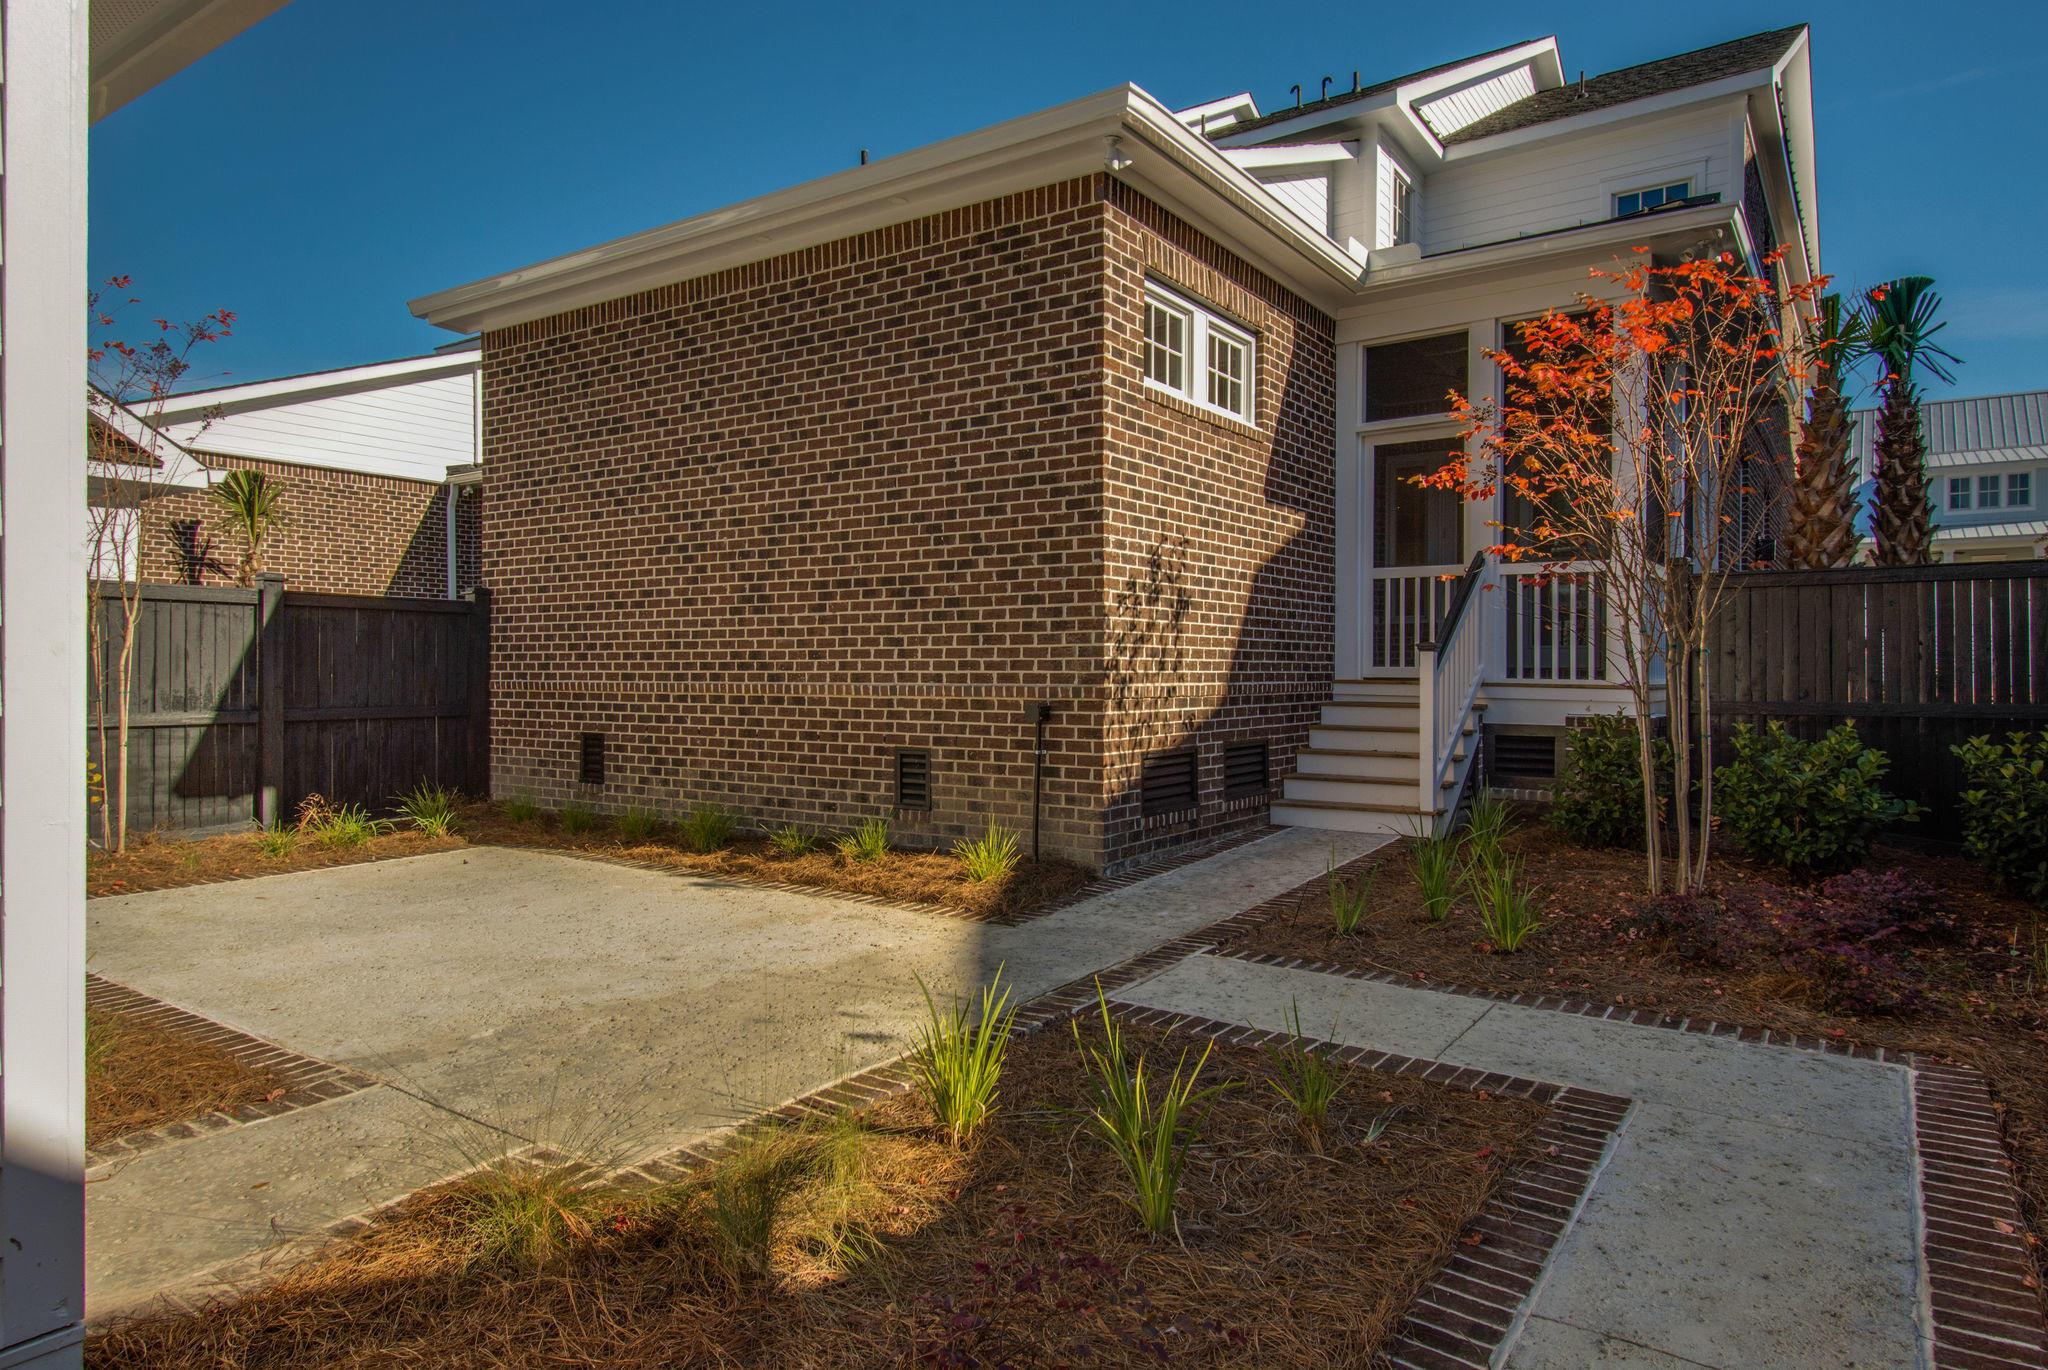 Daniel Island Park Homes For Sale - 112 Brailsford, Charleston, SC - 0